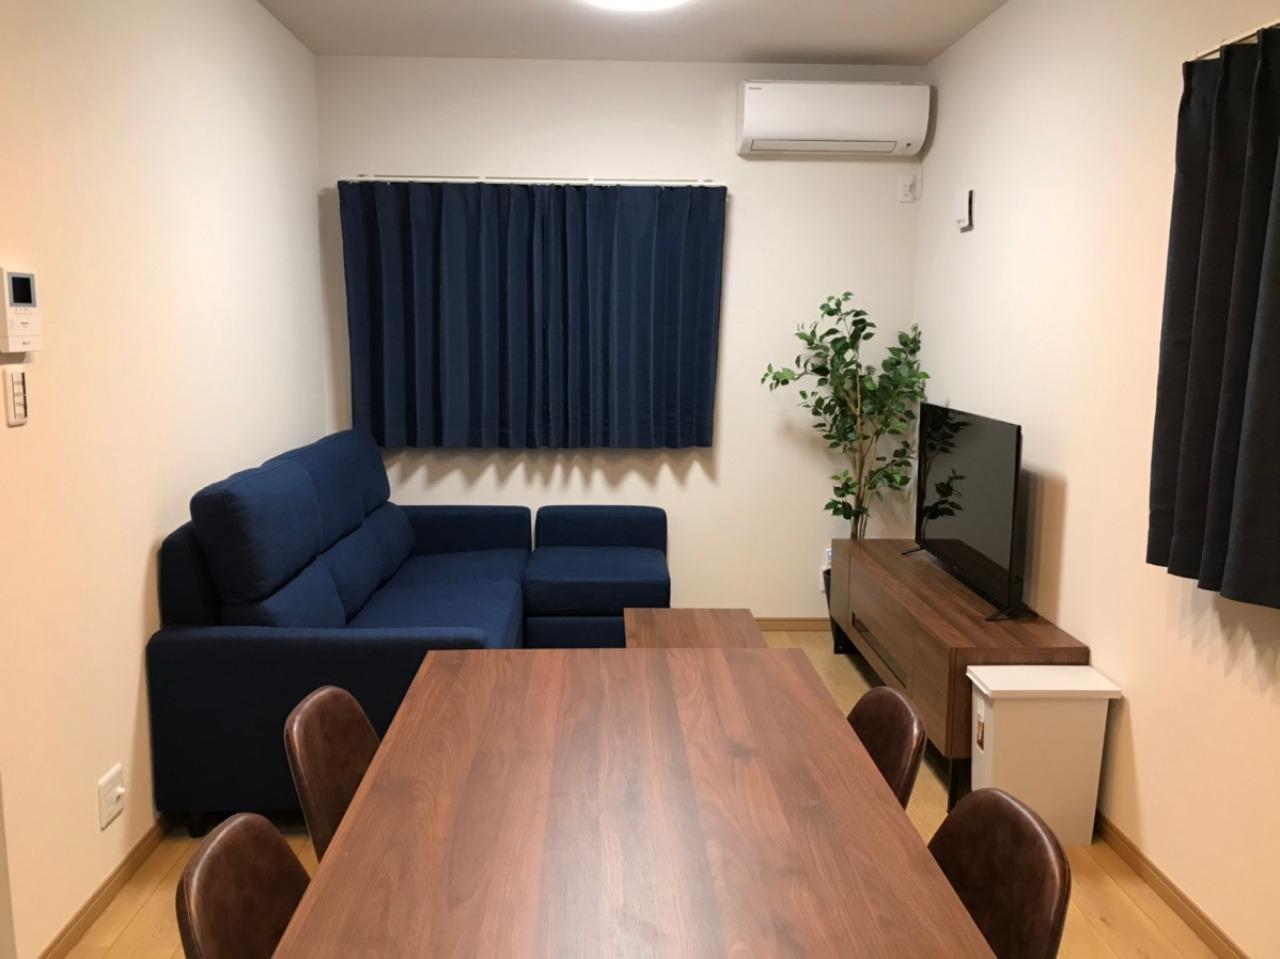 5Minutes 新大阪3 6名部屋 1棟まるまる貸し